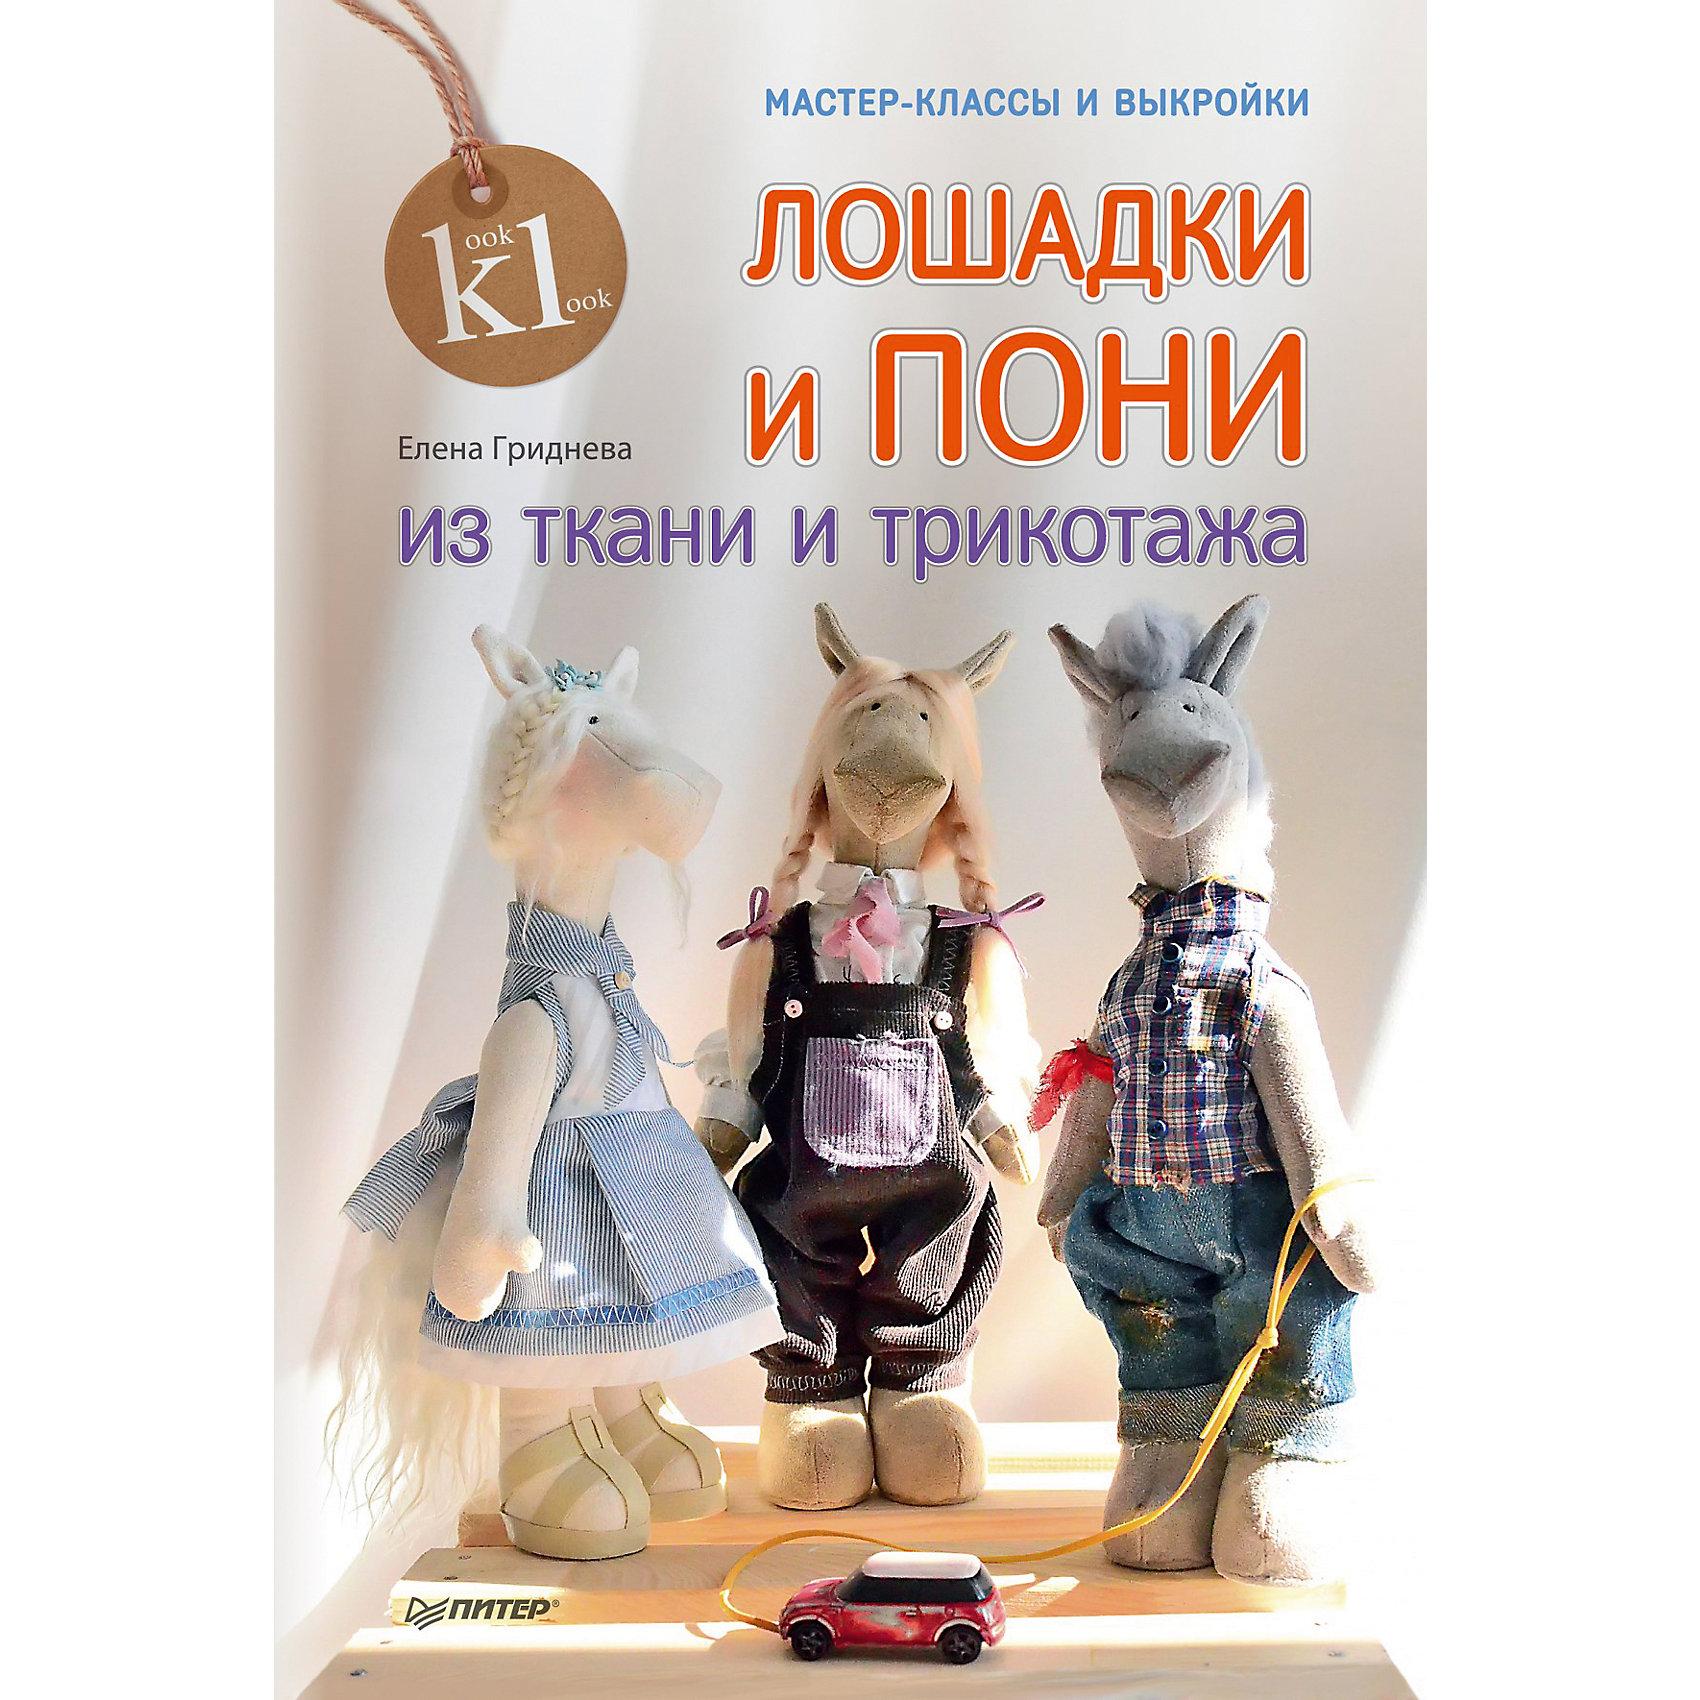 ПИТЕР Комплект из 2 книг Куколки из ткани и трикотажа, Лошадки и пони из ткани и трикотажа сапоги milana сапоги